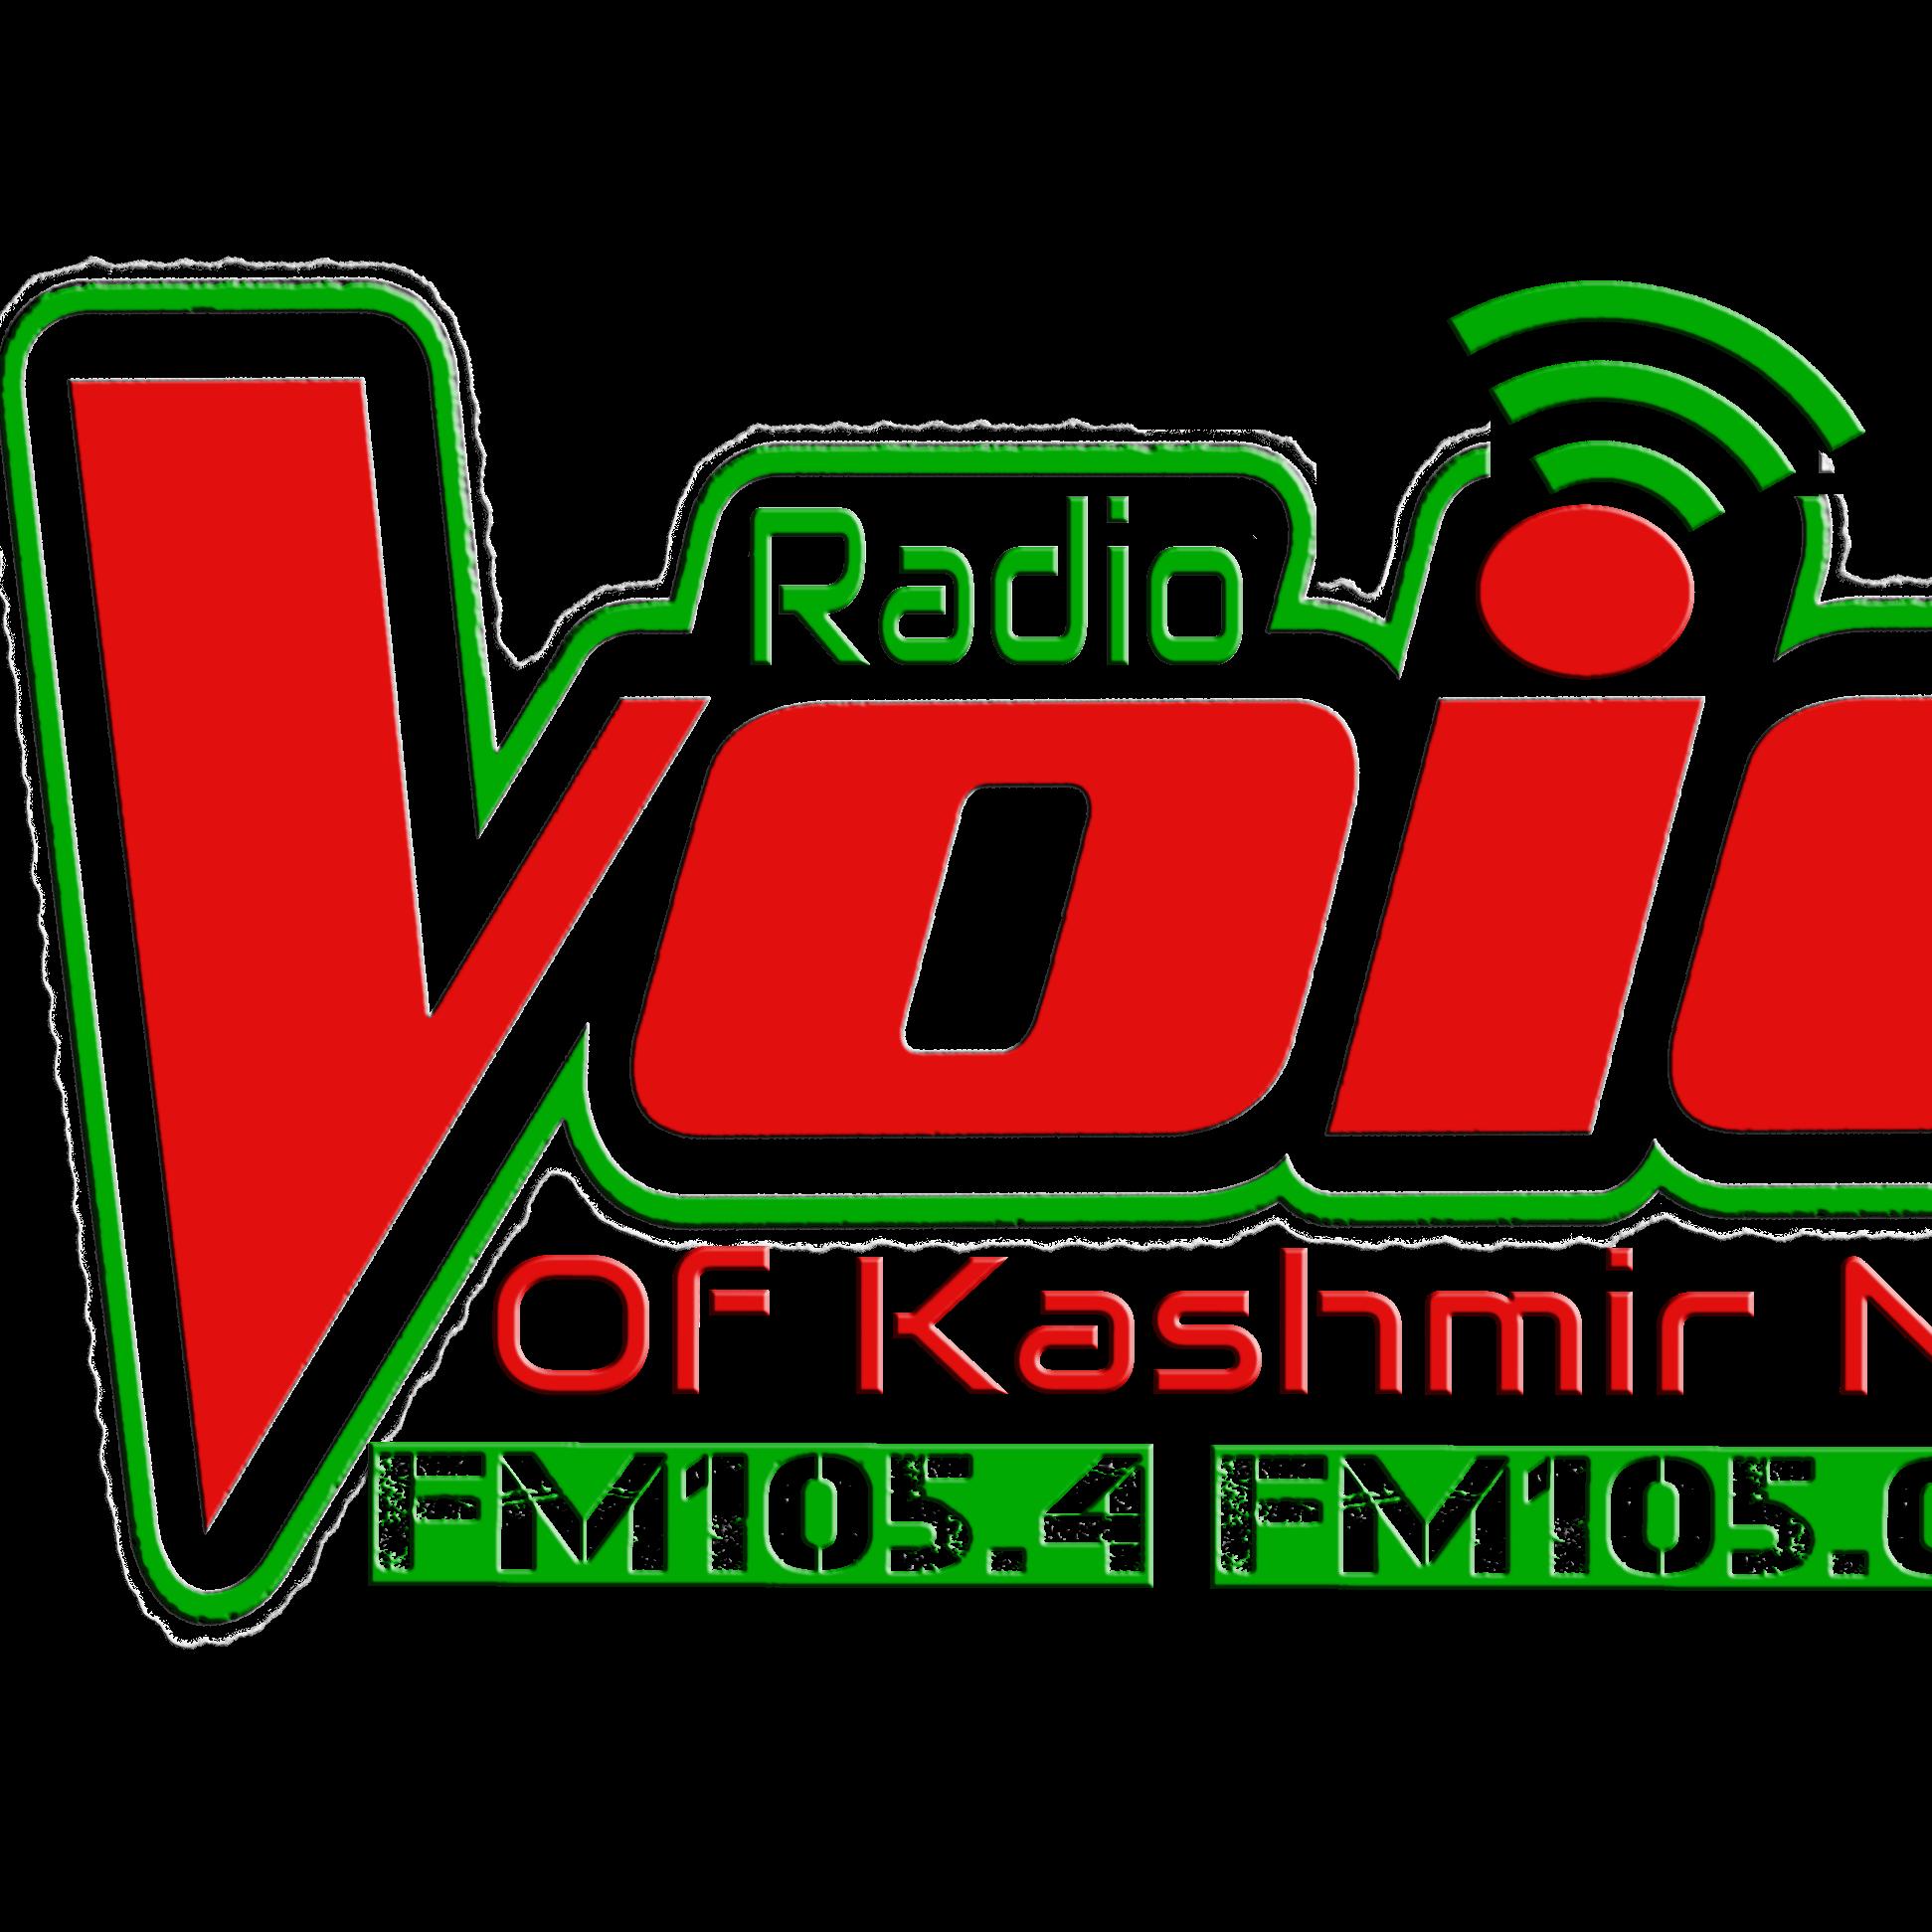 VOK FM 105.4